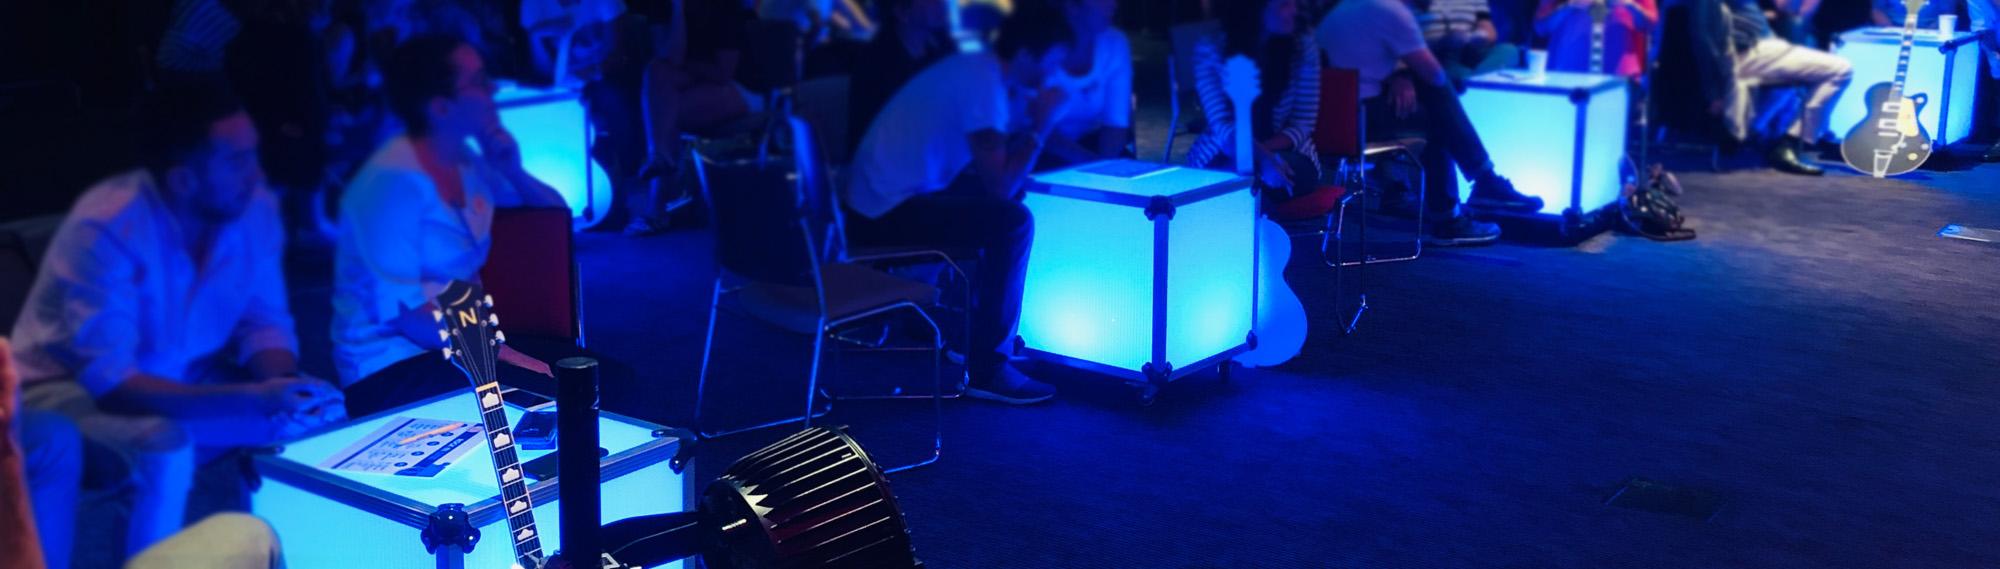 Lightcase set up